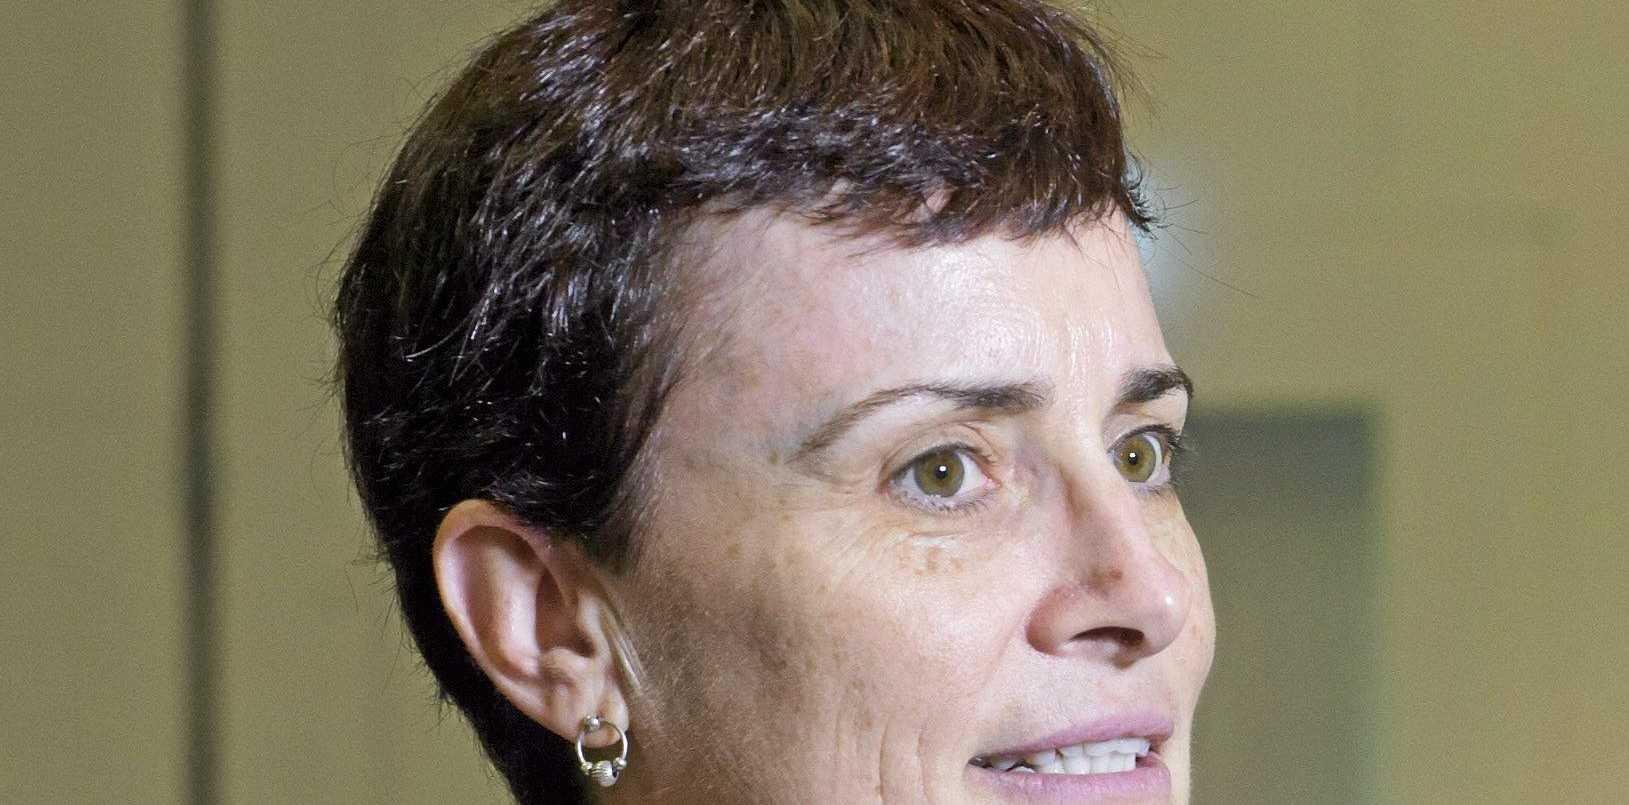 Queensland Police Museum curator Lisa Jones speaks about her job at the museum.